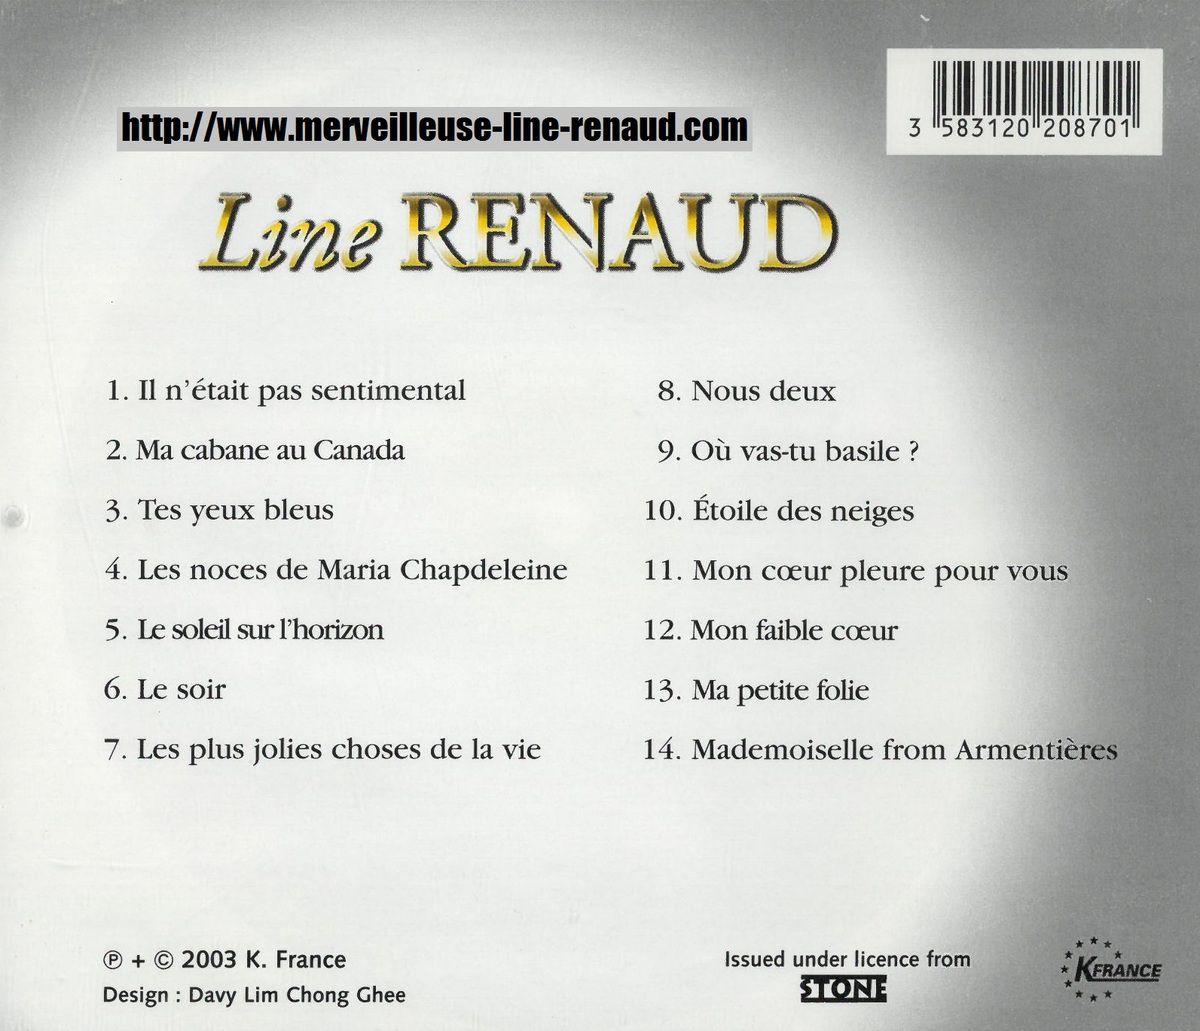 CD: 2003 France - K France CD - 3583120208701 Chansons Passion